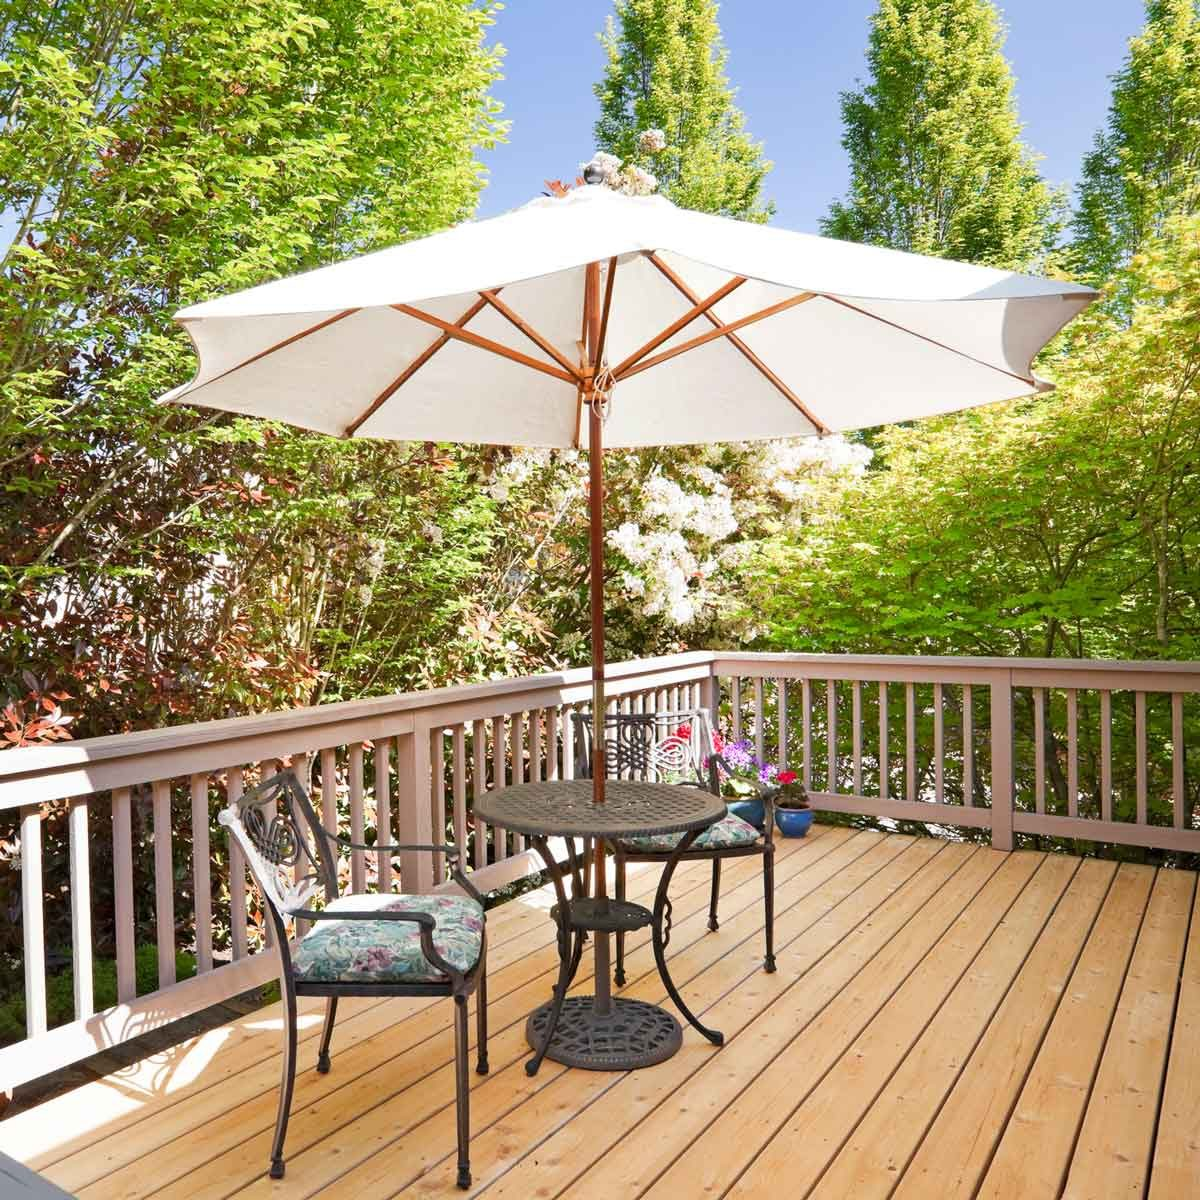 Deck with an umbrella